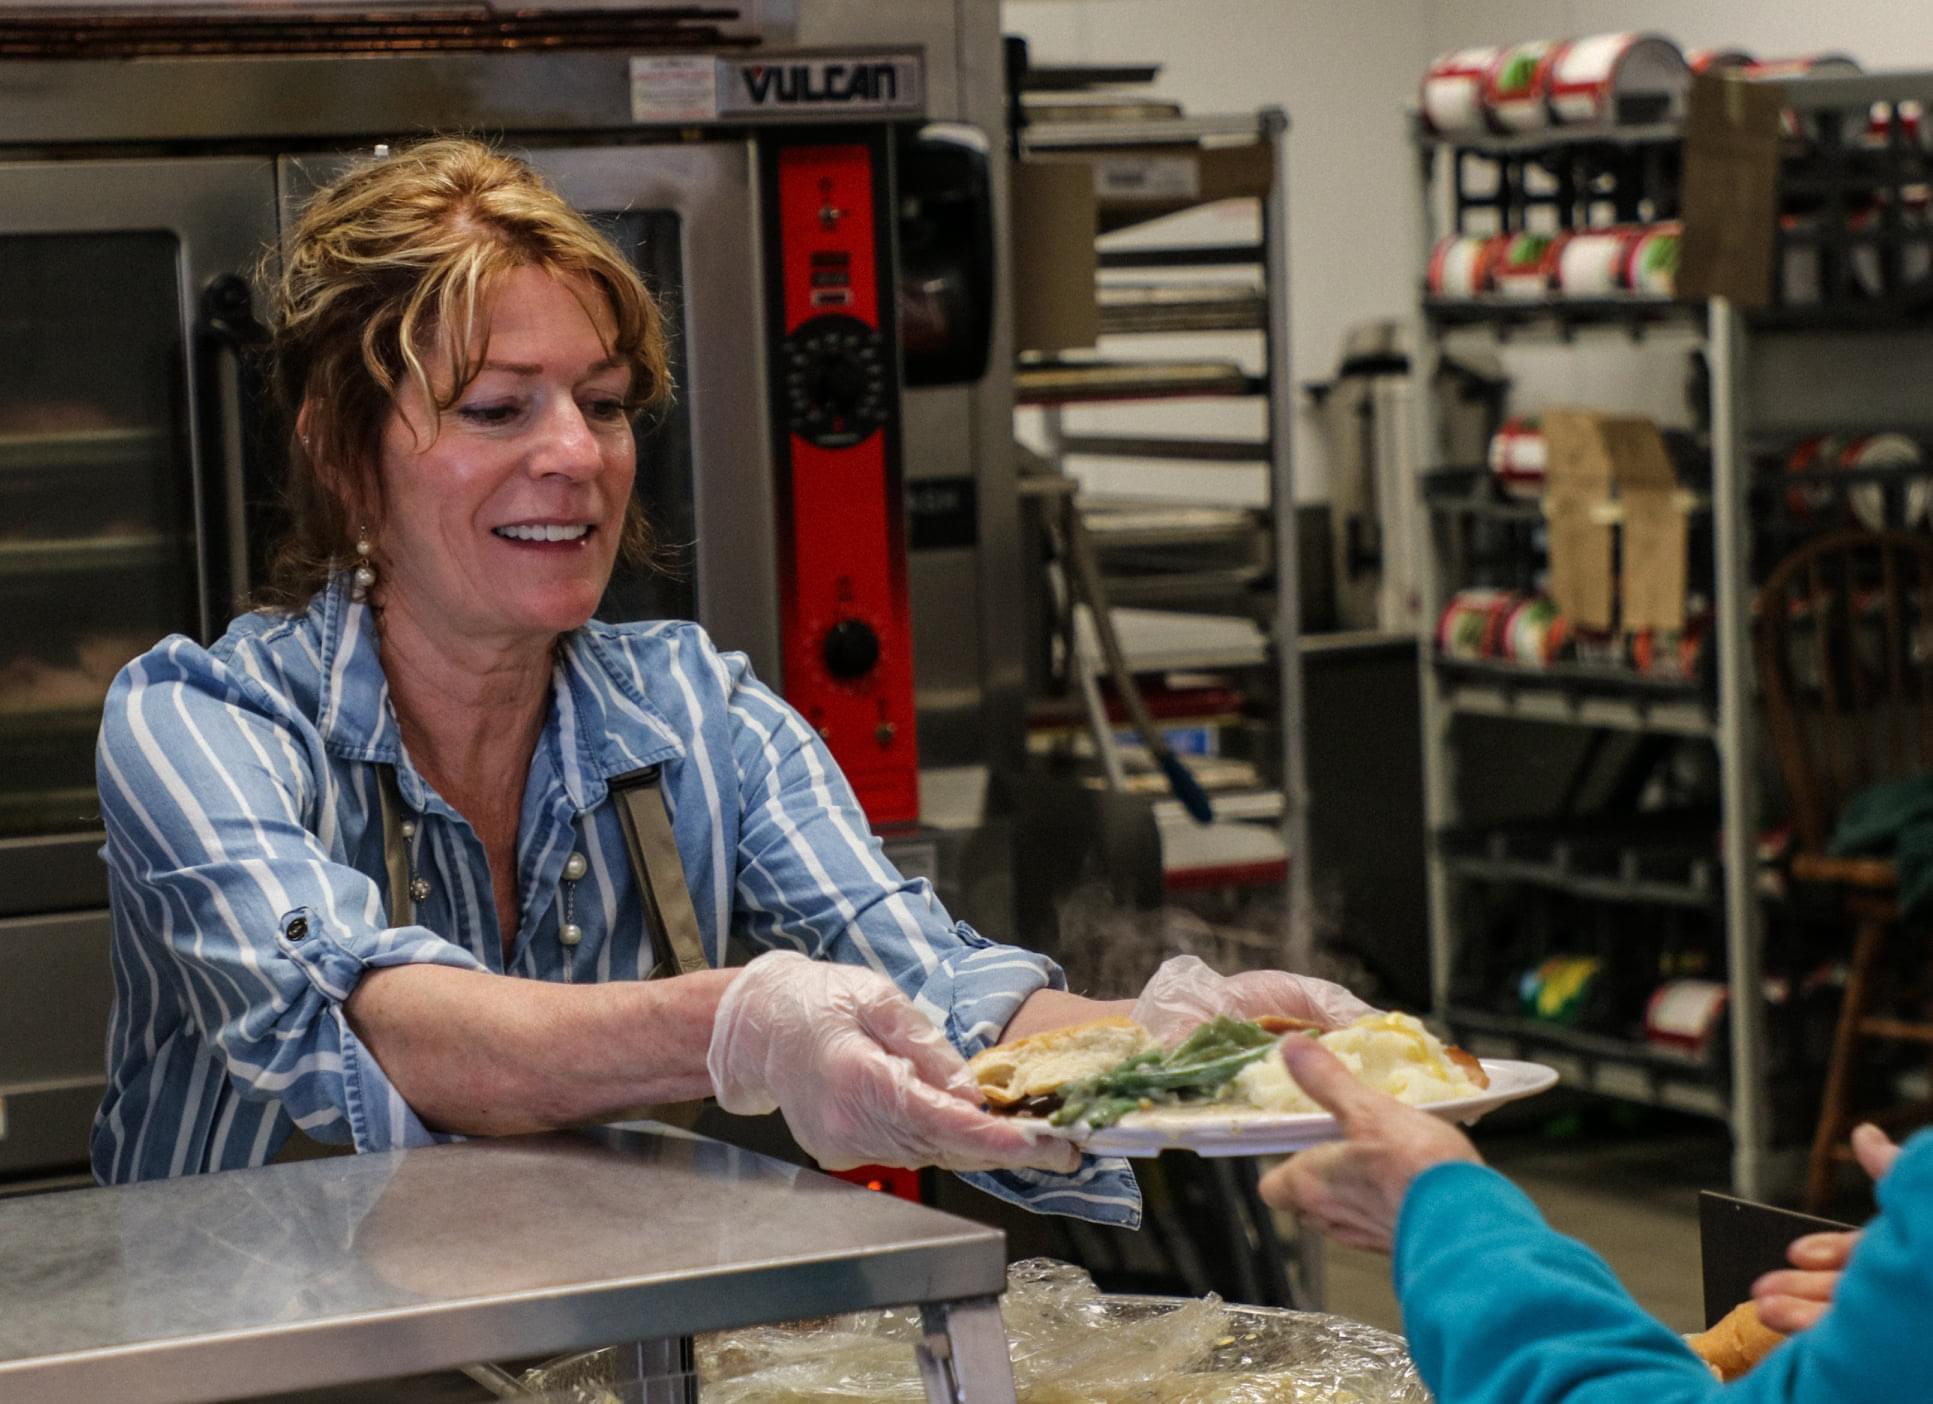 volunteer to feed homeless